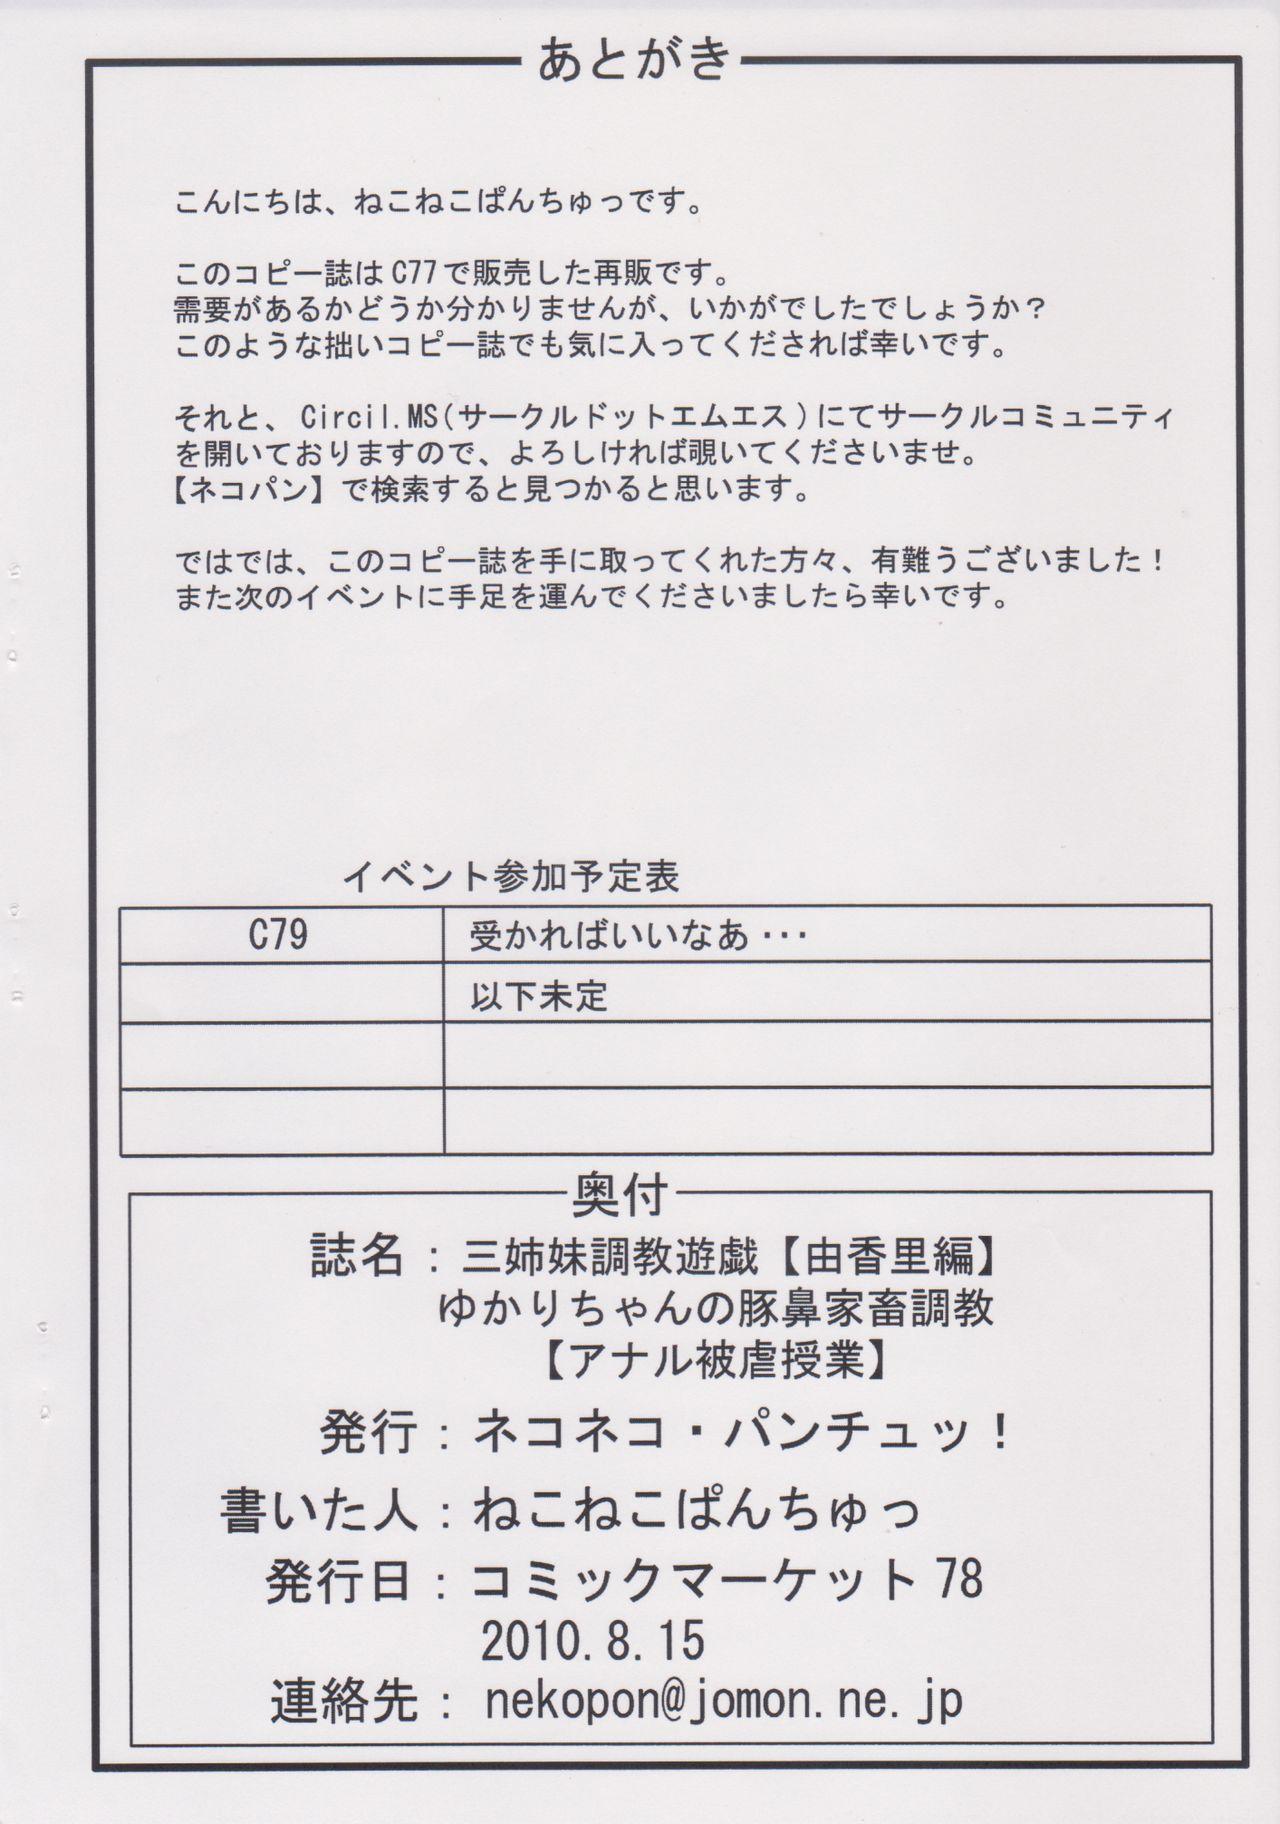 (C78) [Nekoneko Panchu! (Nekoneko Panchu)] Sanshimai Choukyou Yuugi [Yukari Hen] Yukari-chan no Butabana Kachiku Choukyou [Anal Higyaku Jugyou] 18